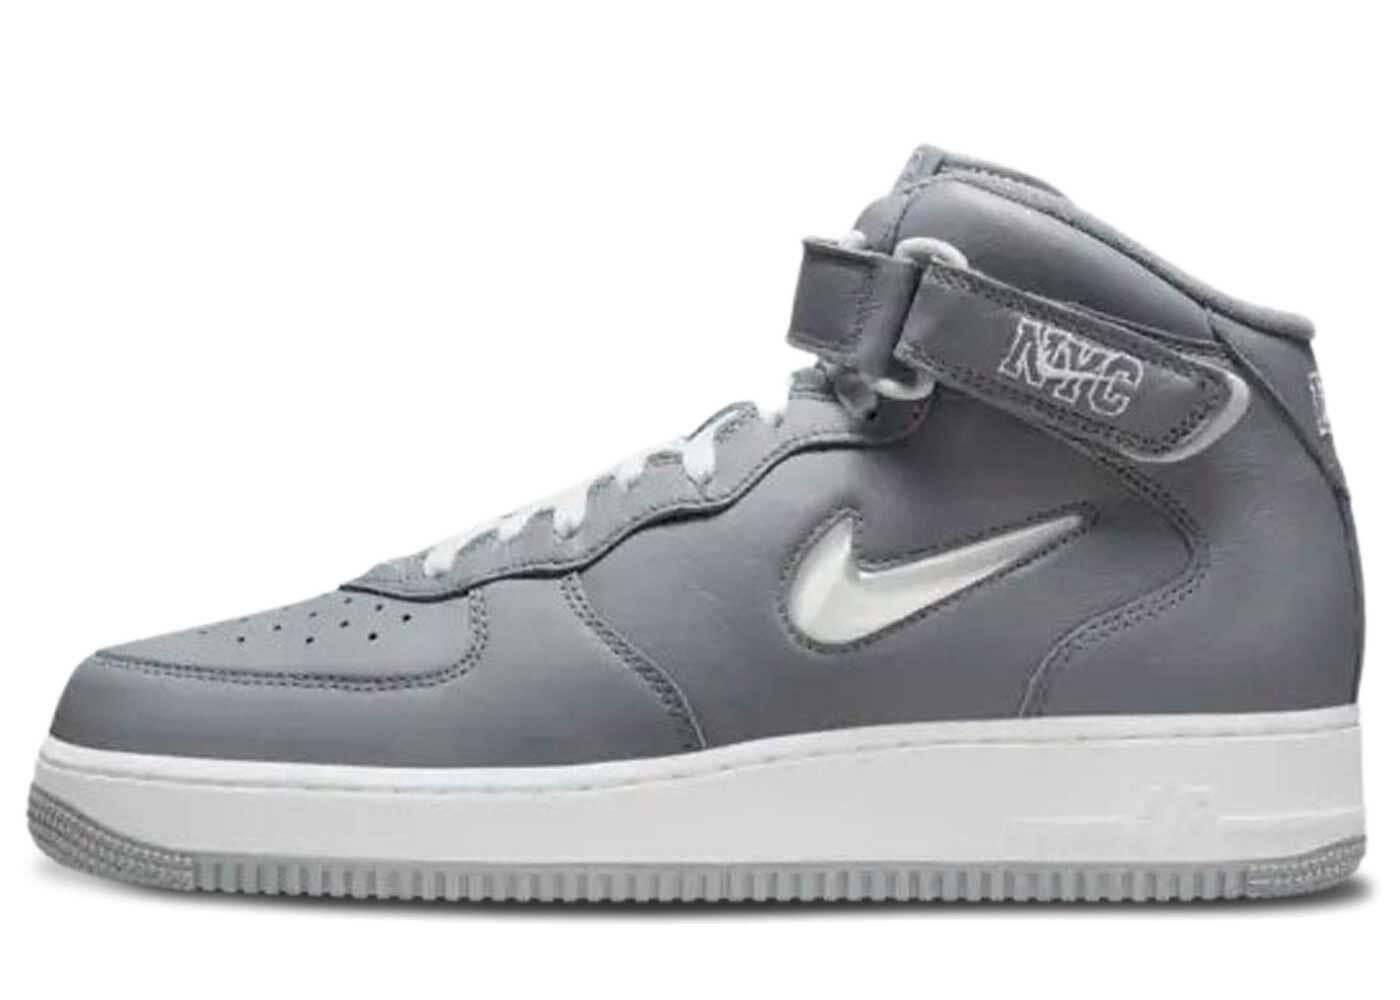 Nike Air Force 1 Mid NYC Cool Greyの写真